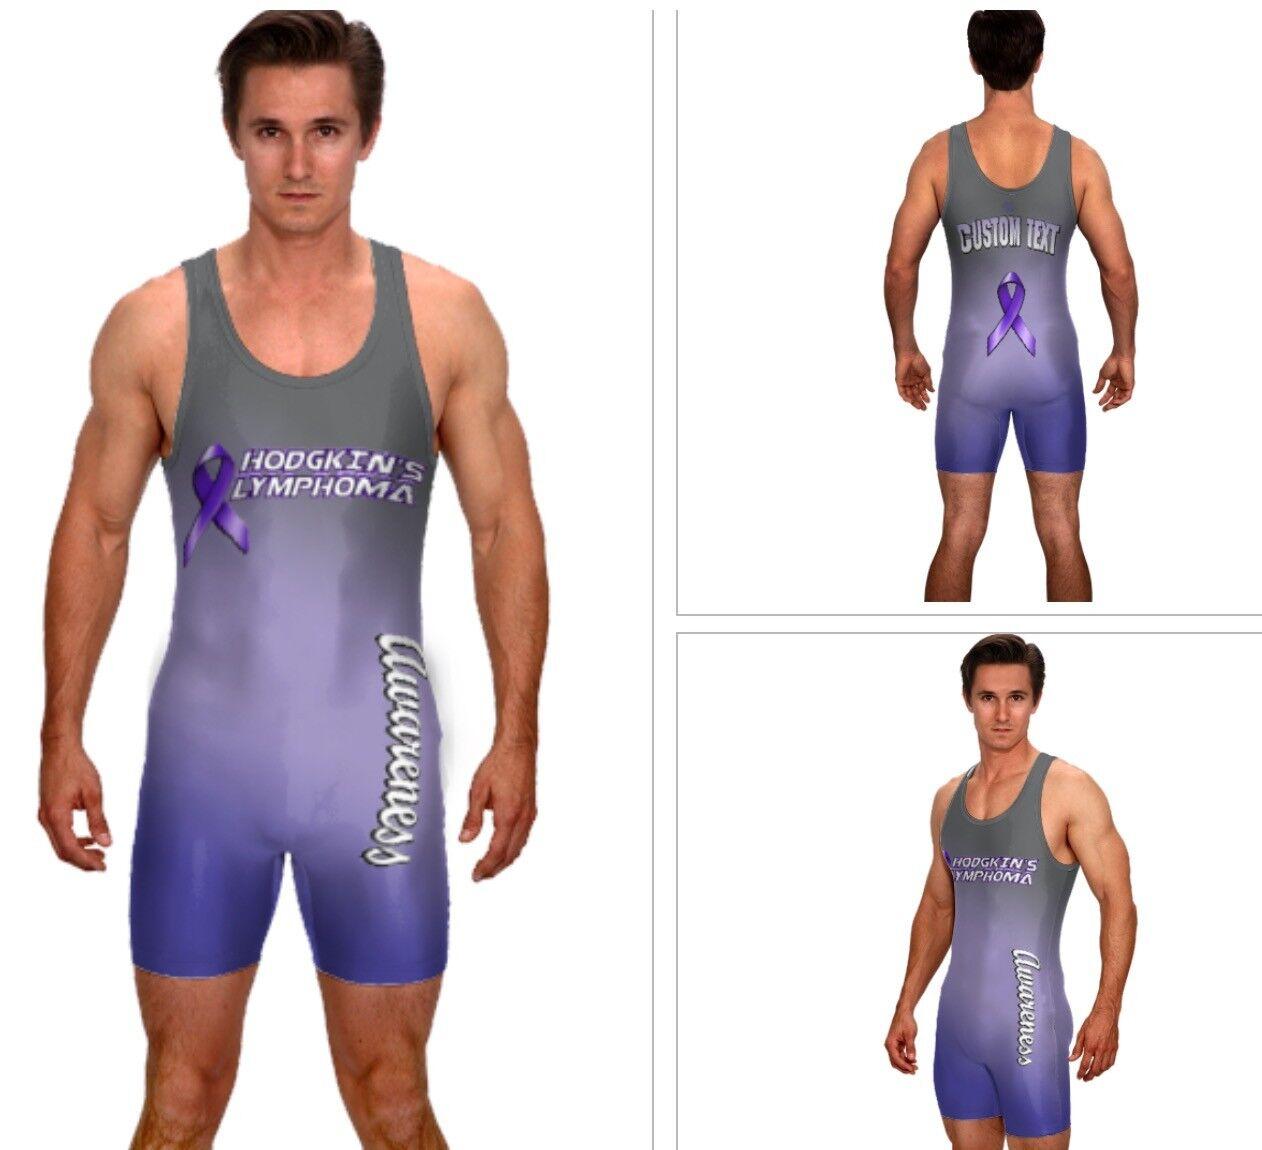 Hodgkin's Lymphoma wrestling singlet, powerlifitng singlet includes custom text